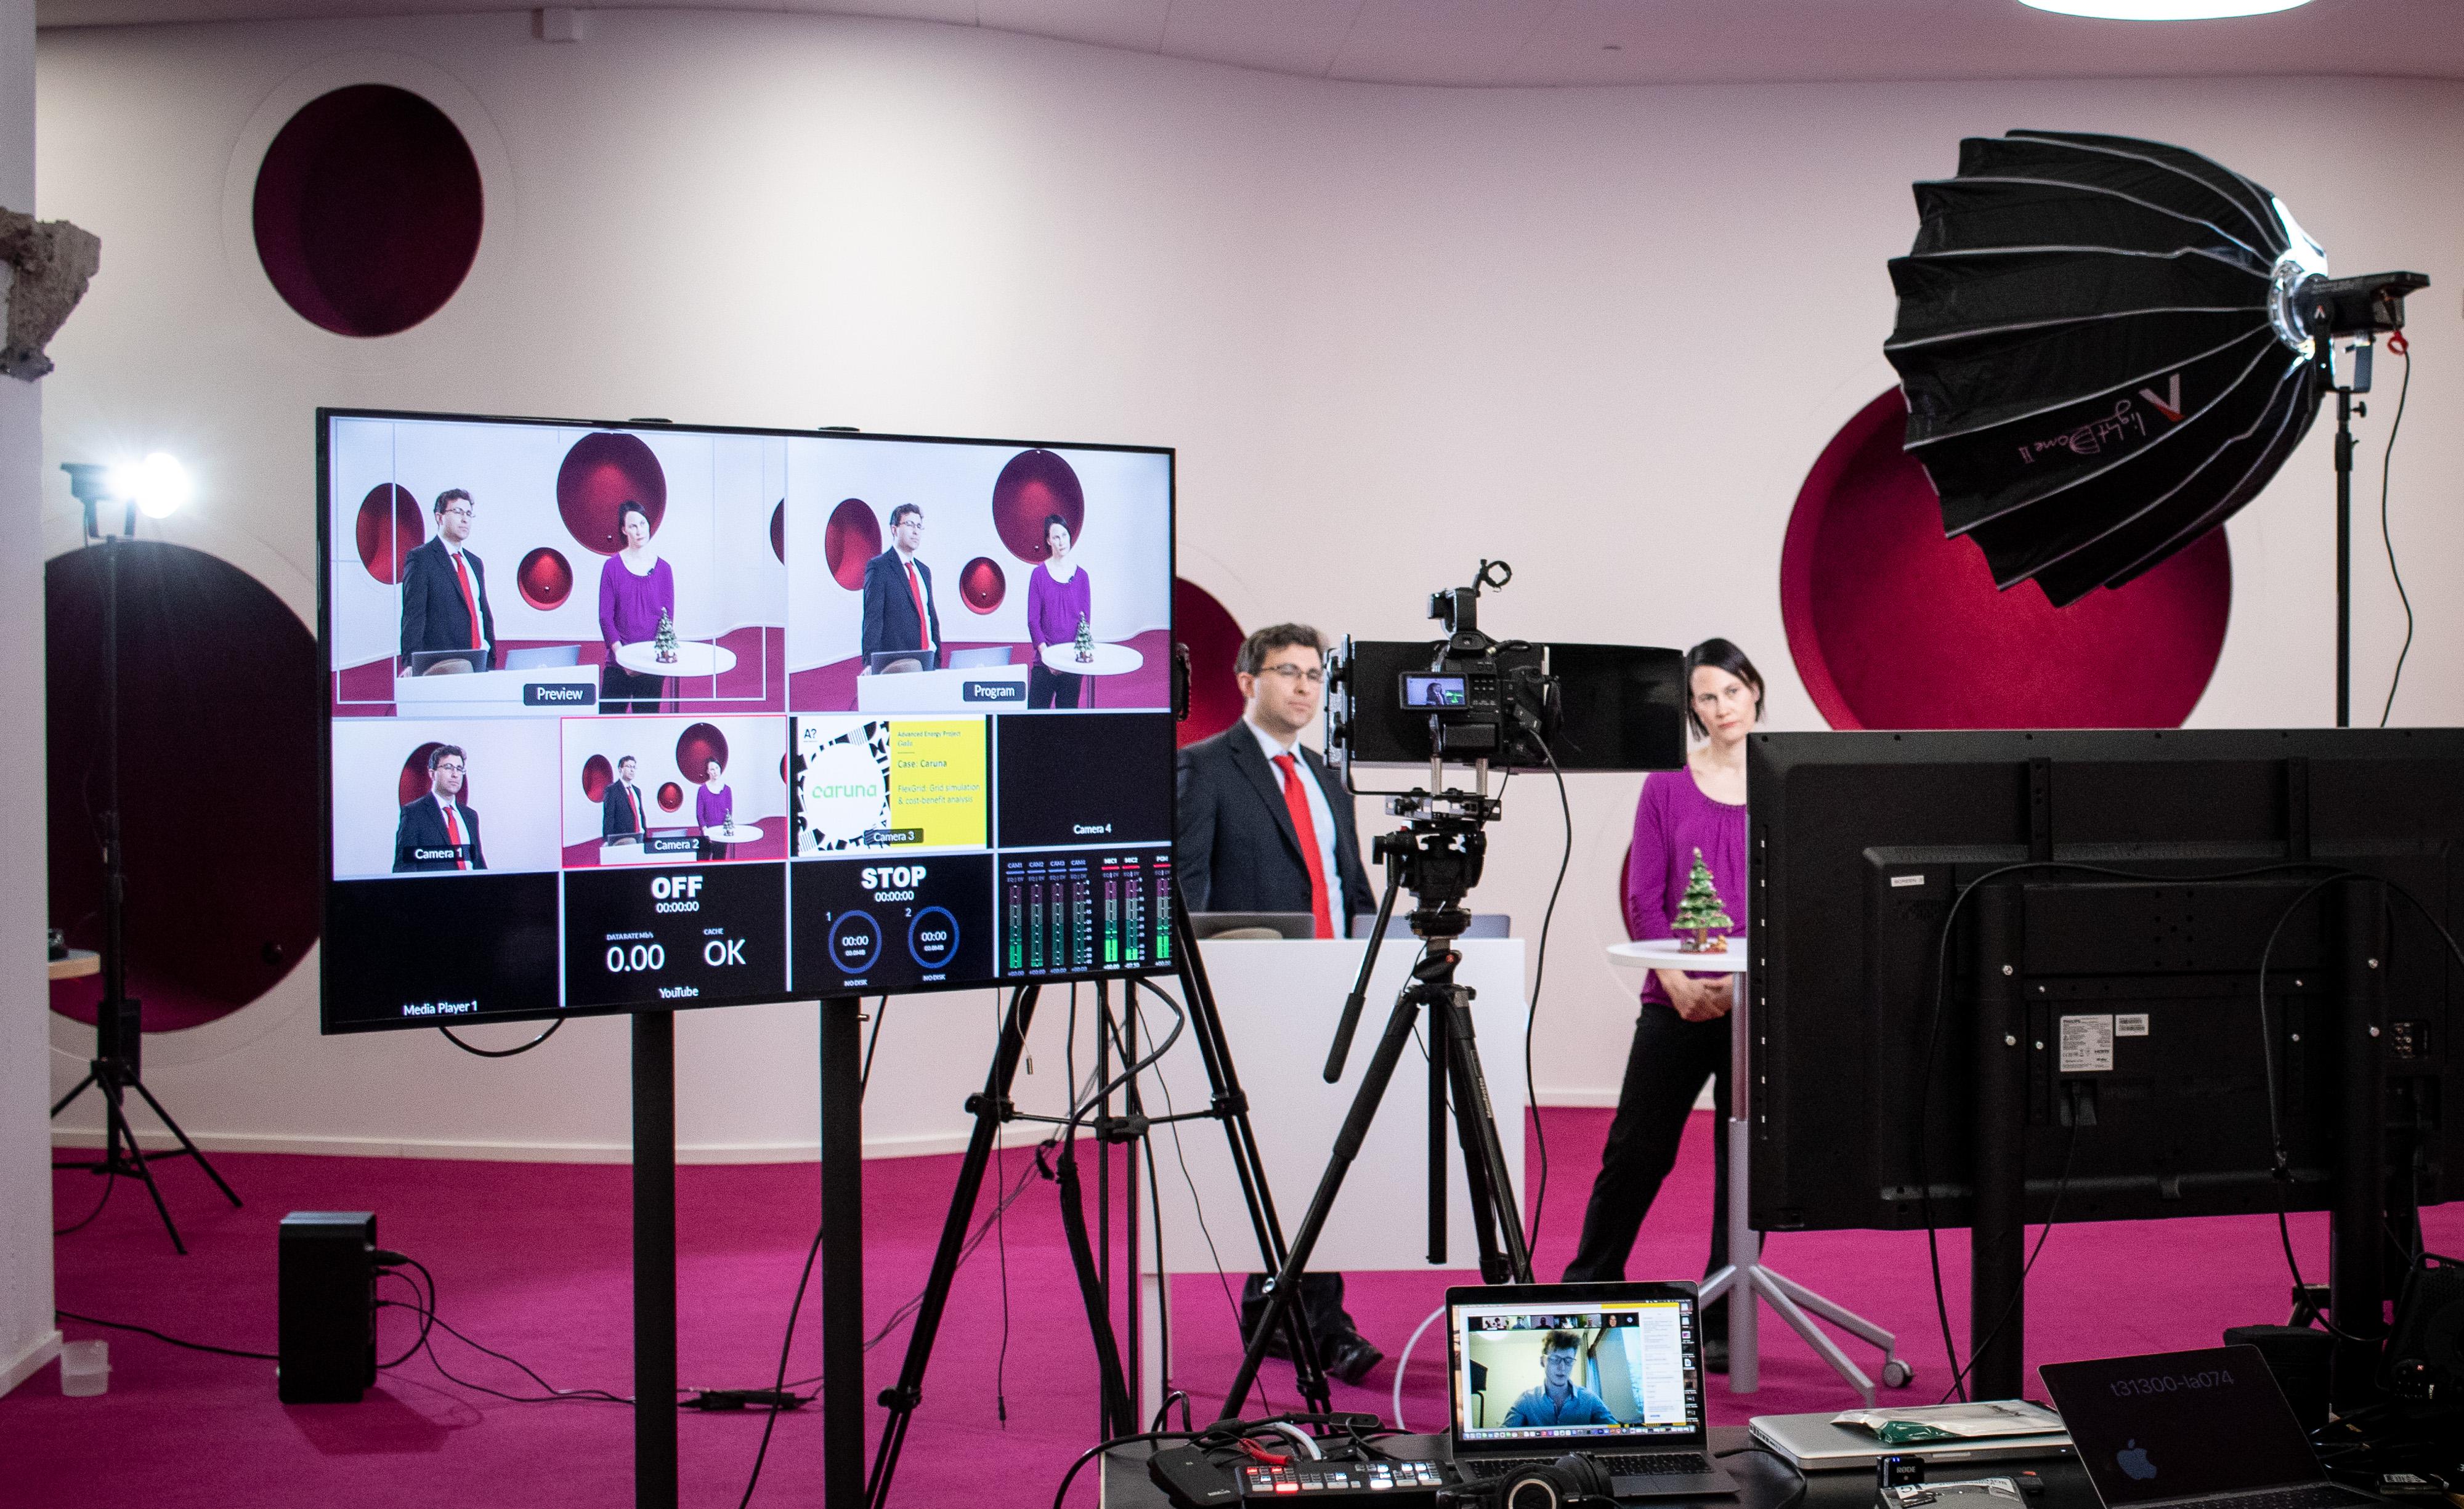 Behind the scenes look at zoom webinar live stream at Aalto University